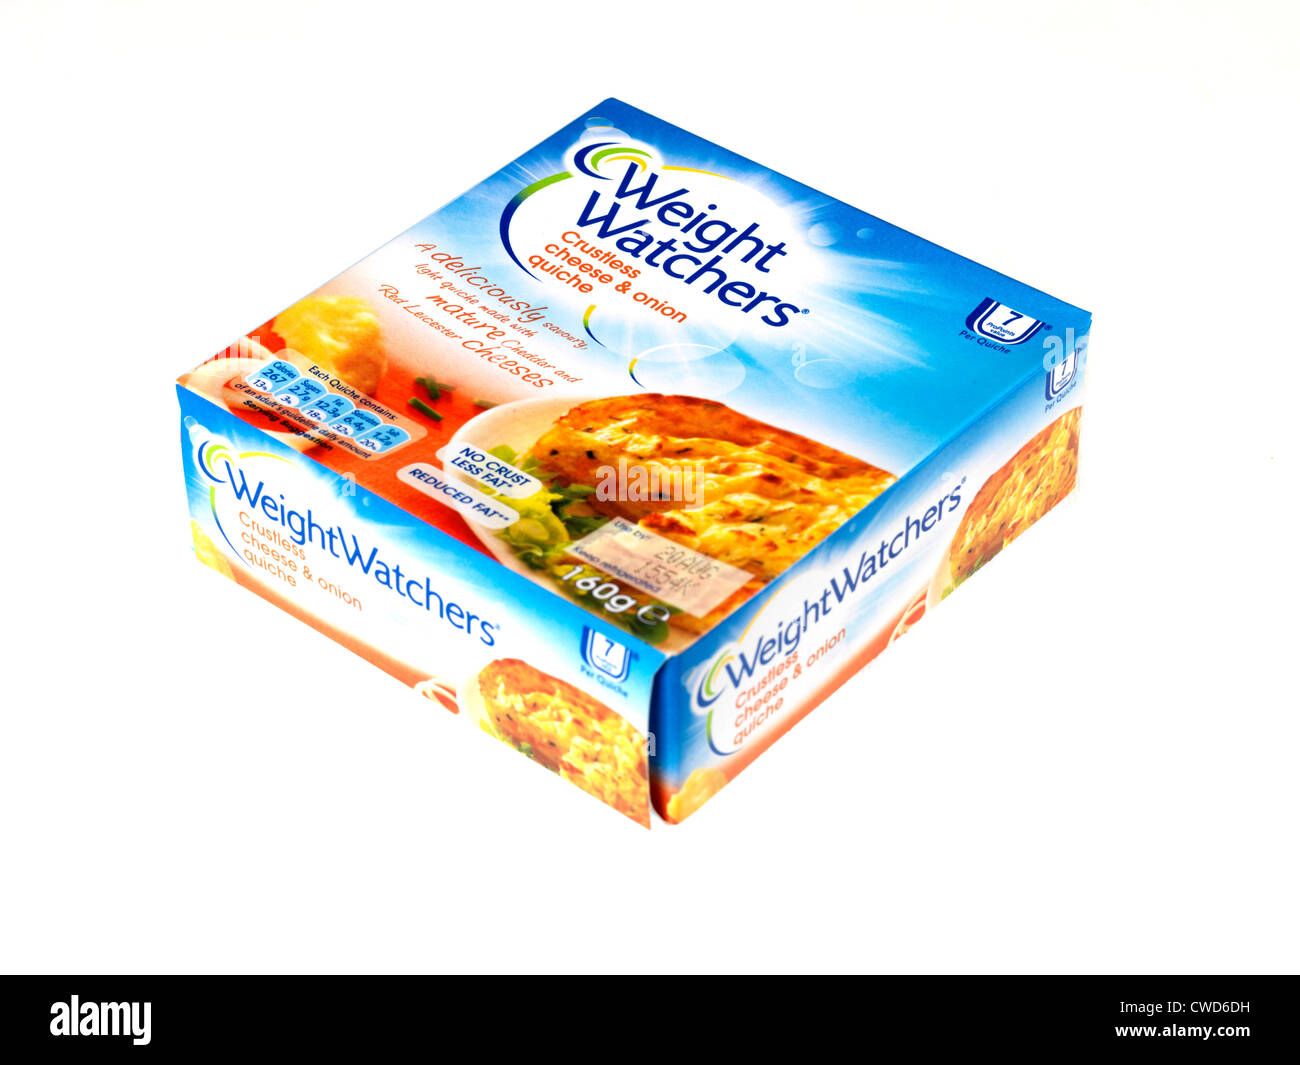 Weight Watchers Quiche - Stock Image